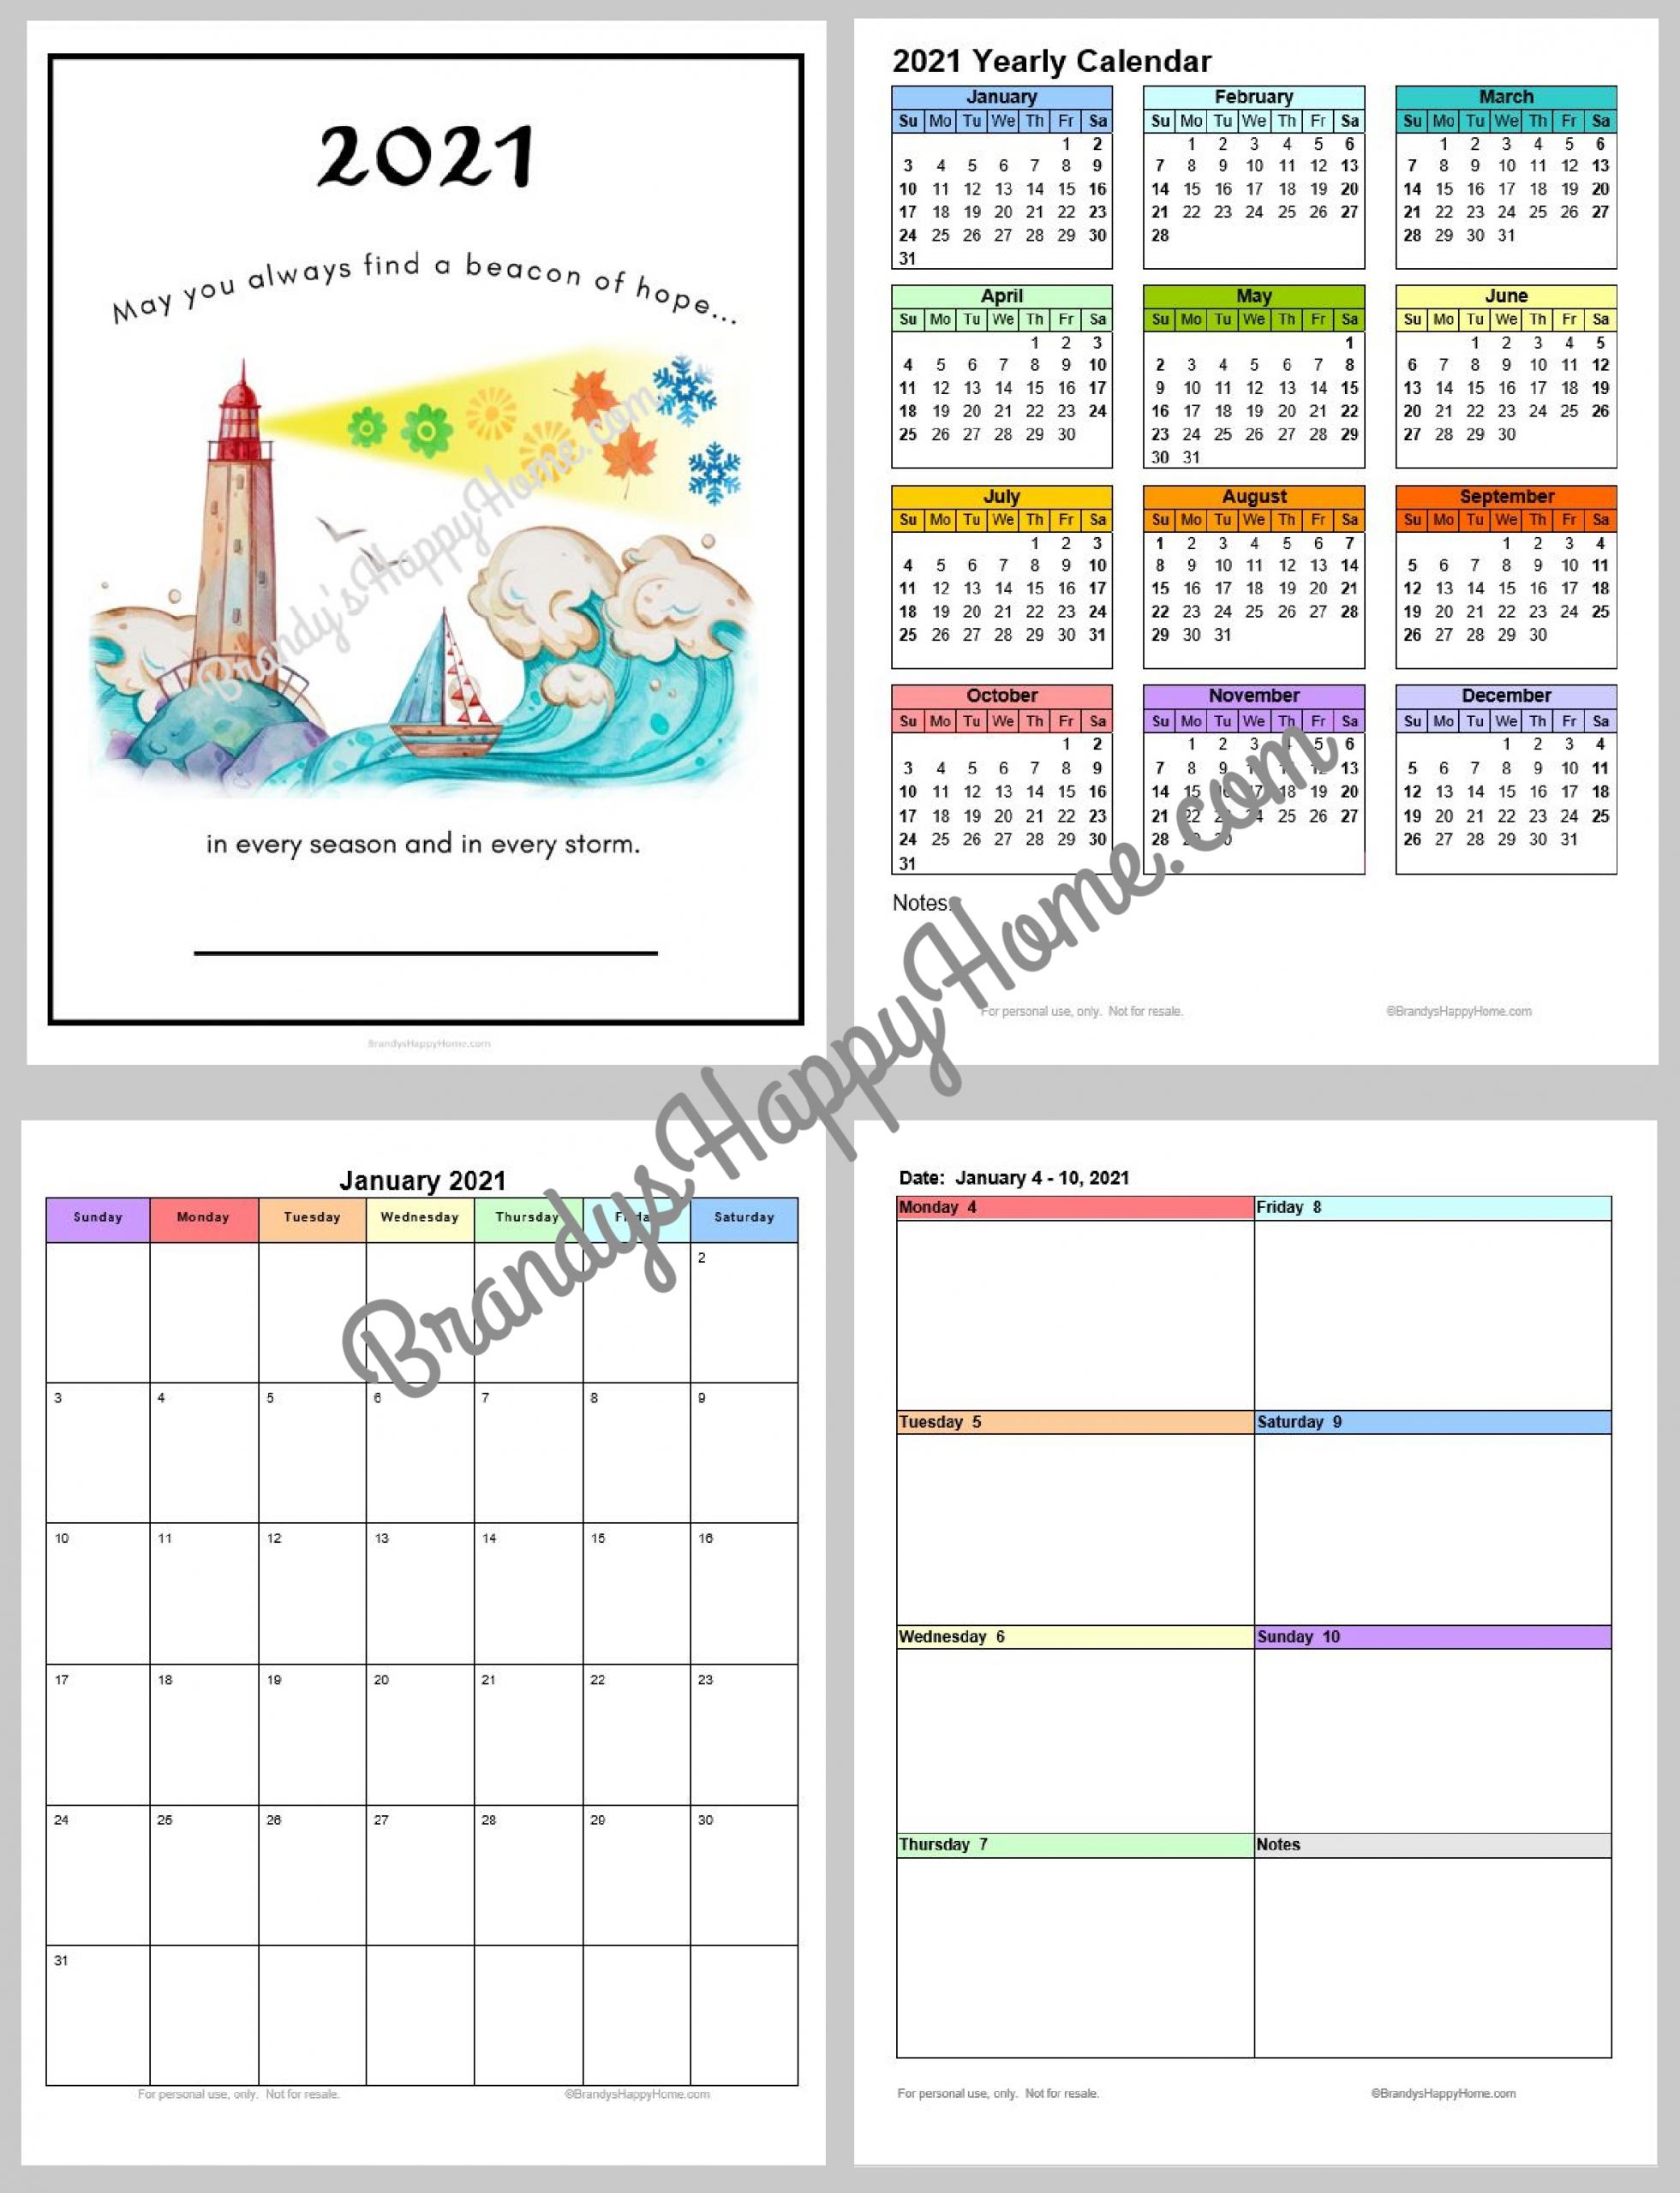 Free 2021 Calendar Planner Printables-2021 Monthly Calendar Printable 2 Page